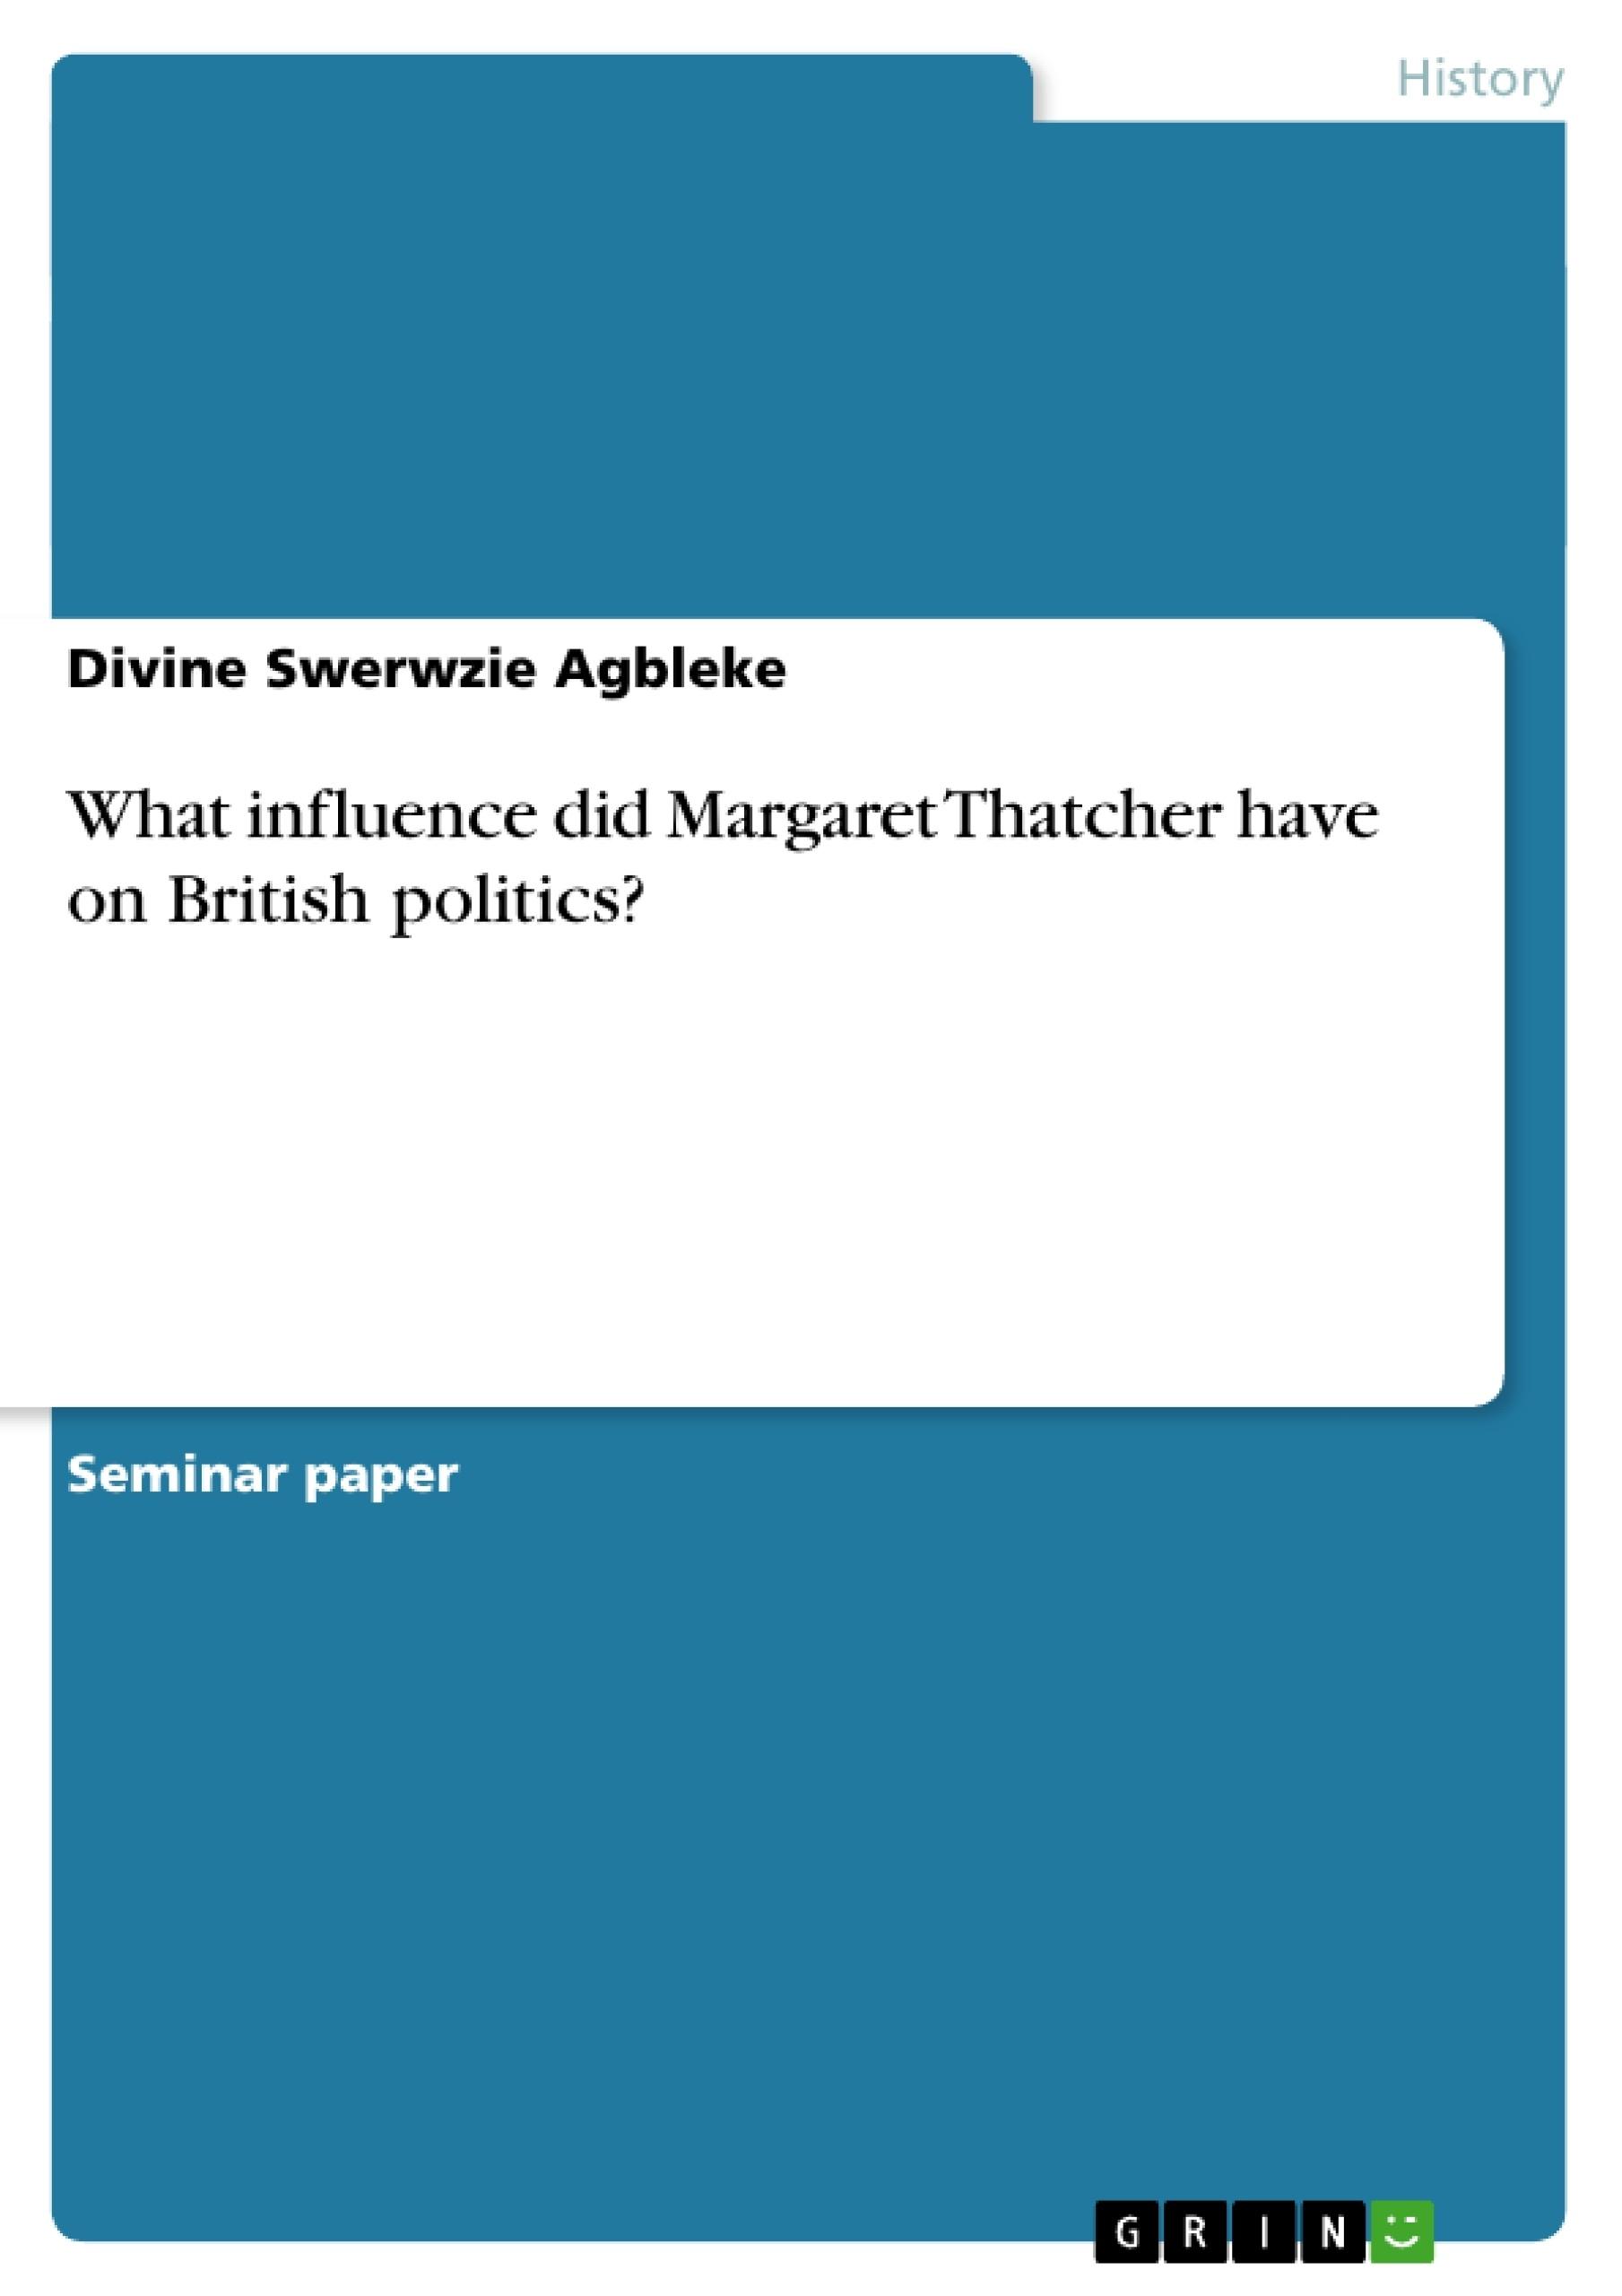 Title: What influence did Margaret Thatcher have on British politics?